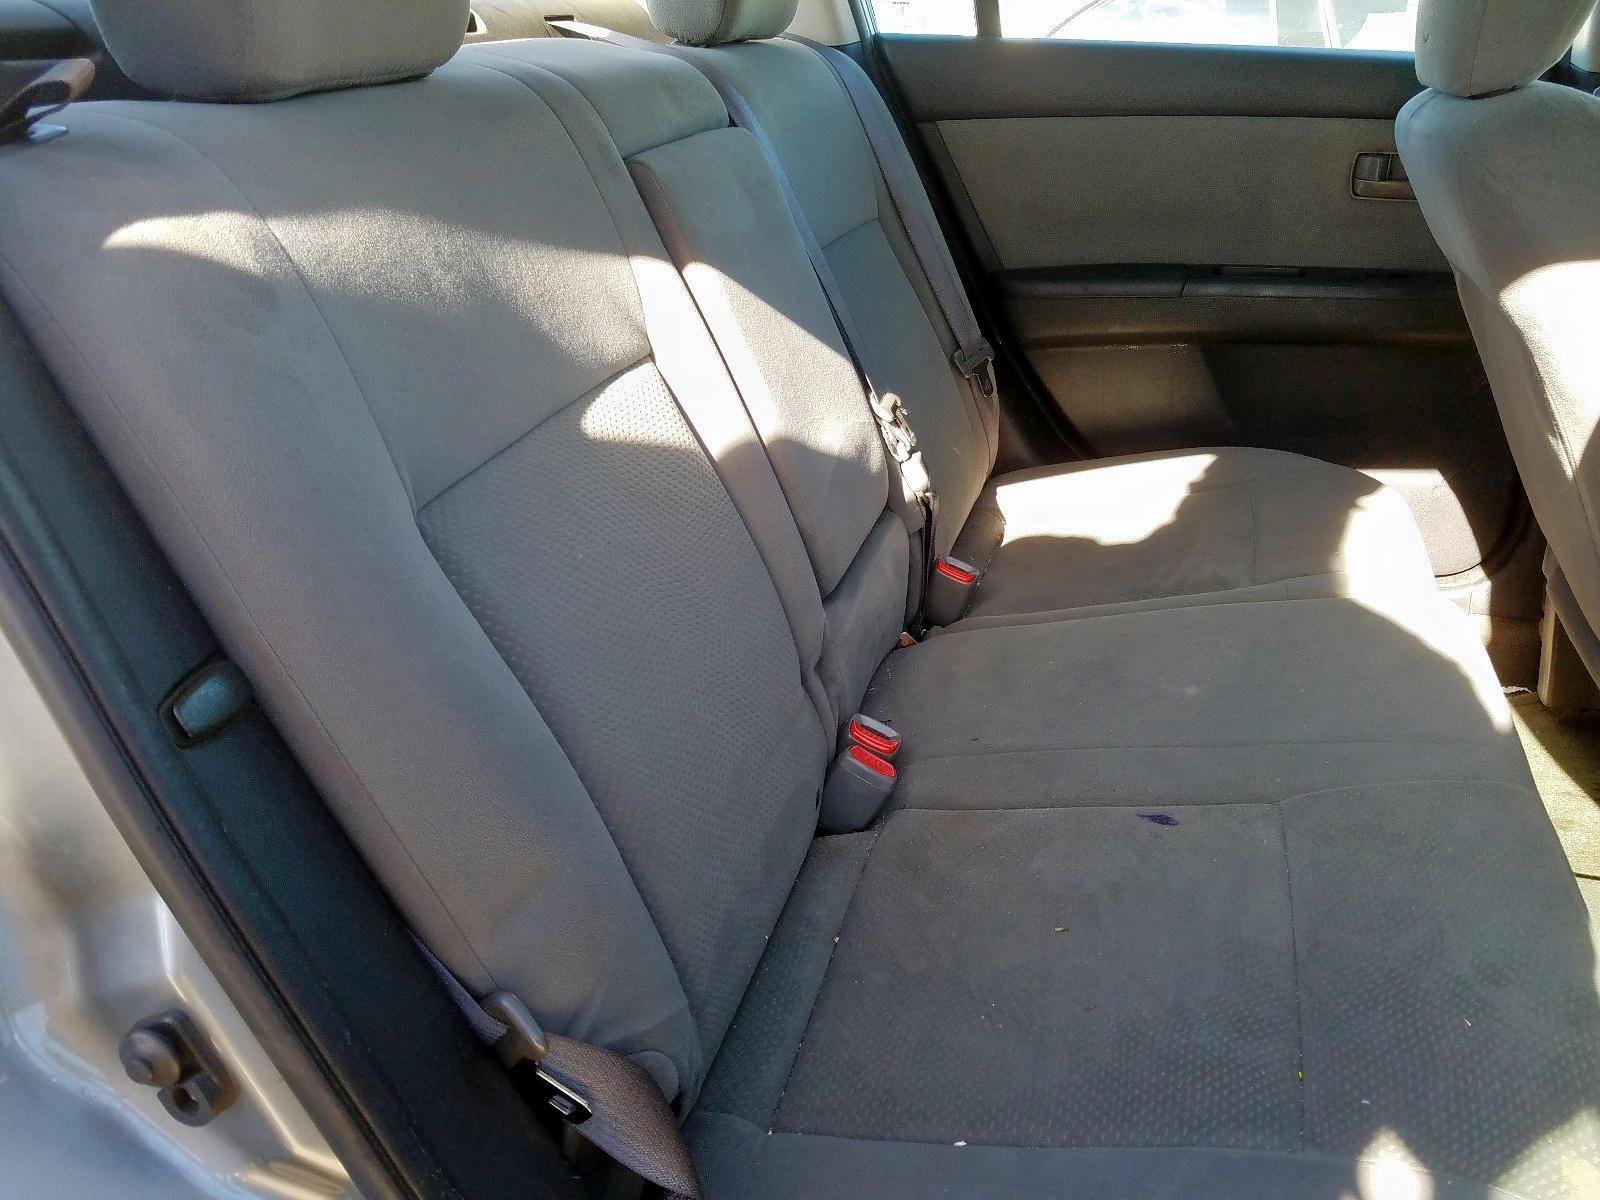 3N1AB6AP5CL773893 - 2012 Nissan Sentra 2.0 2.0L detail view